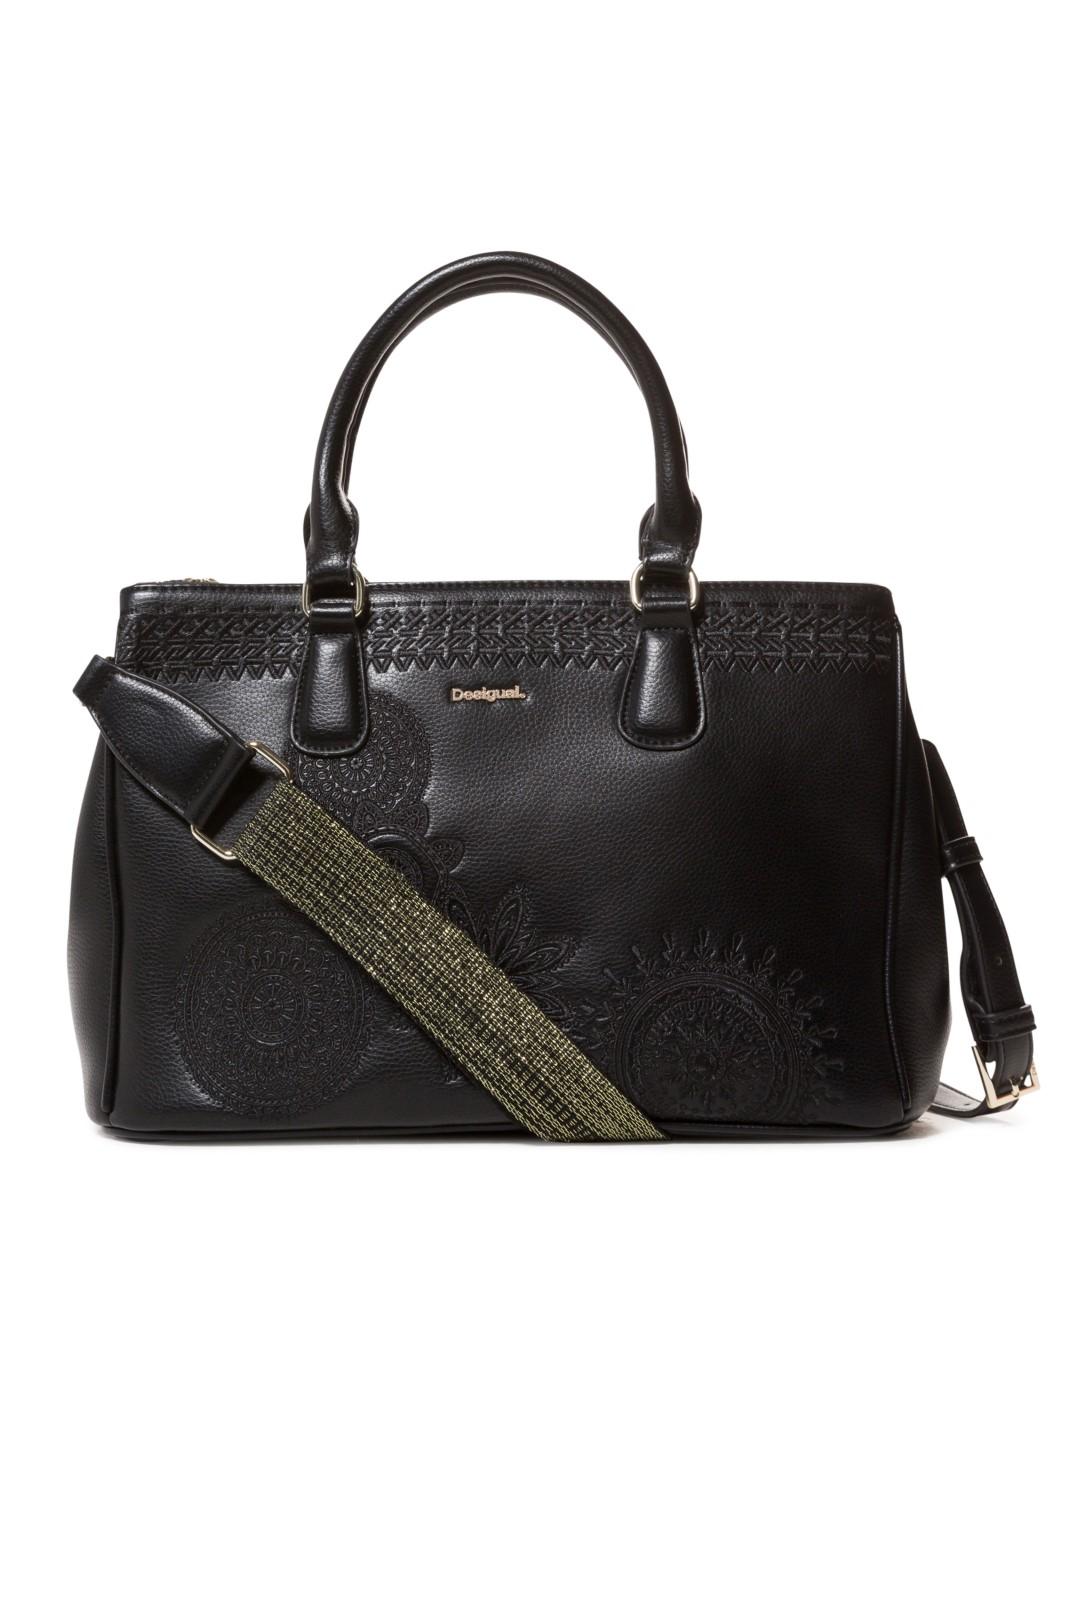 Desigual černá kabelka Bols Dark Amber Cabo - Glami.cz e4b24212a14